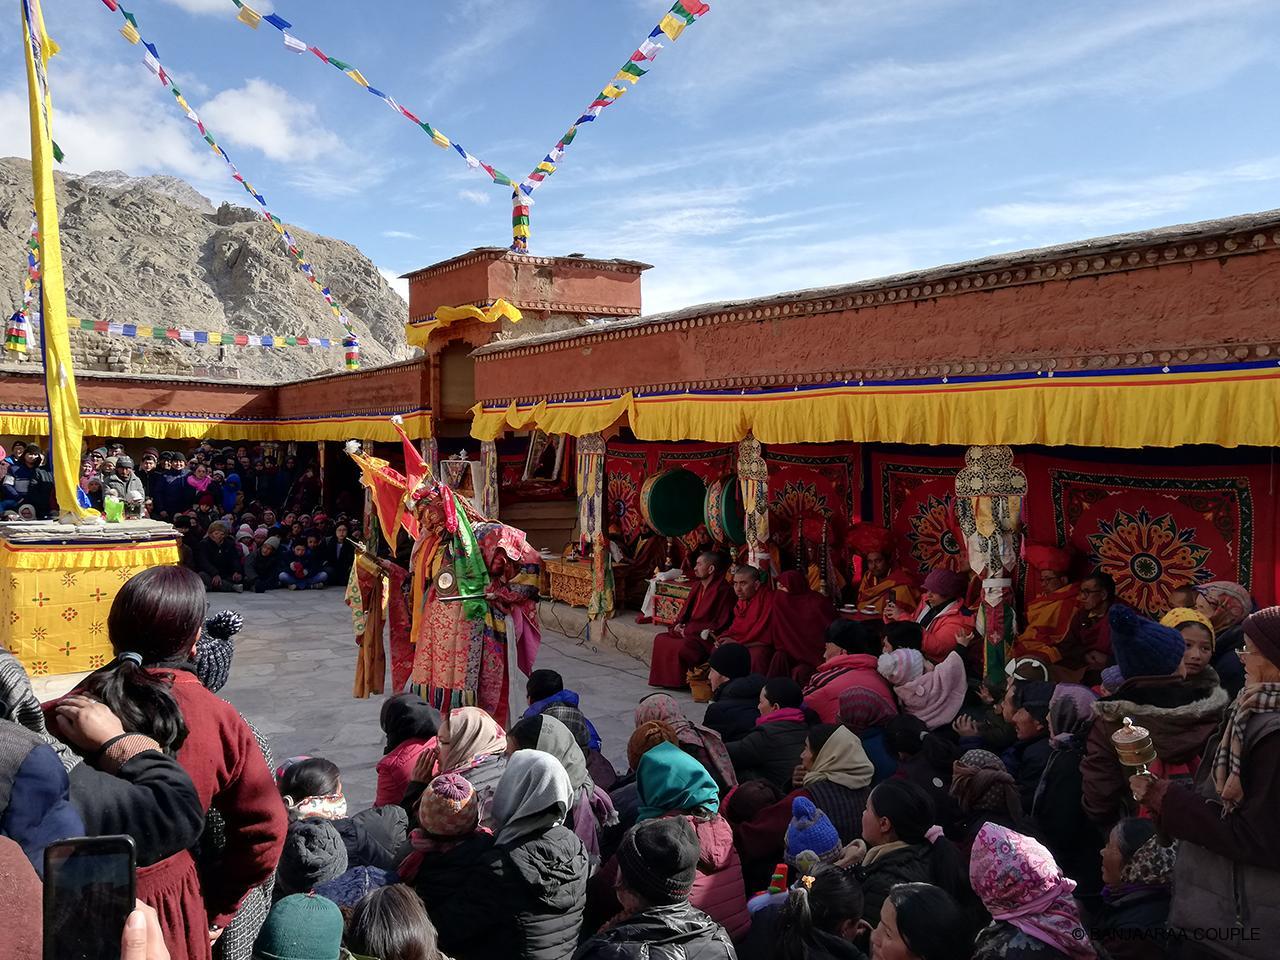 A monk dancing in the festival wearing full attire